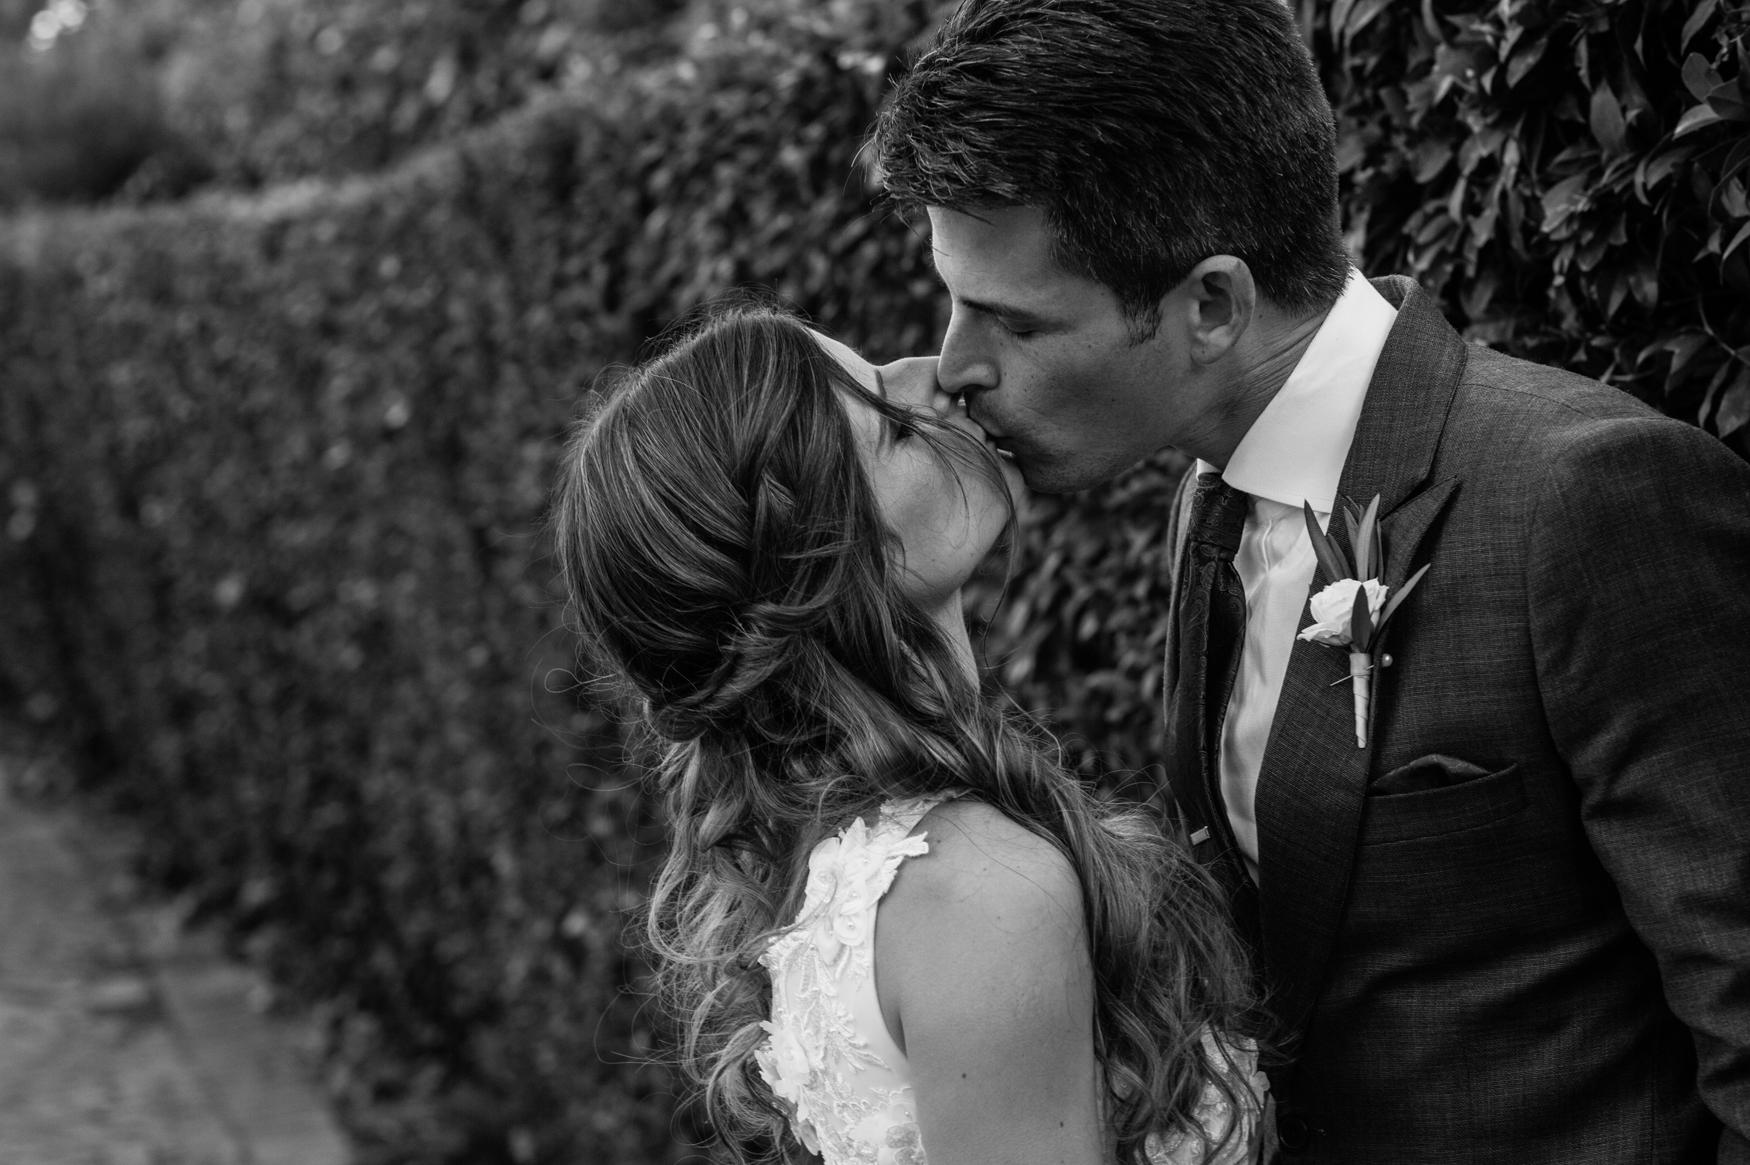 Leon_&_Martine's_Wedding_Photographs_17th_April_2019_@johnhenryweddingphoto_Low_Resolution_Web-412.JPG